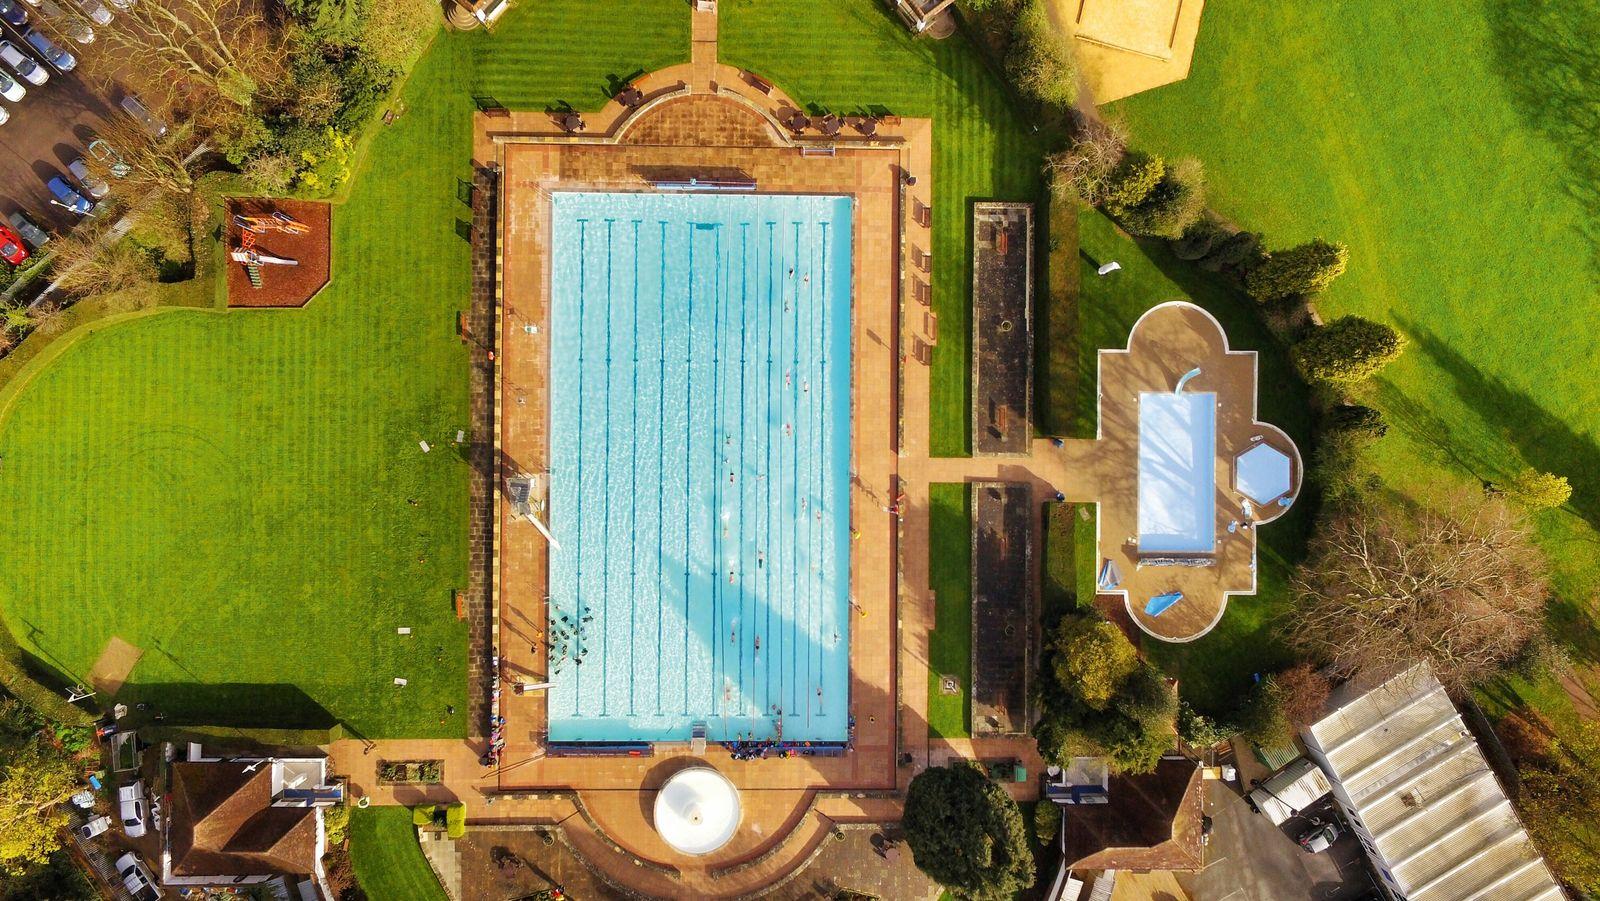 Sandford Parks Lido, Cheltenham